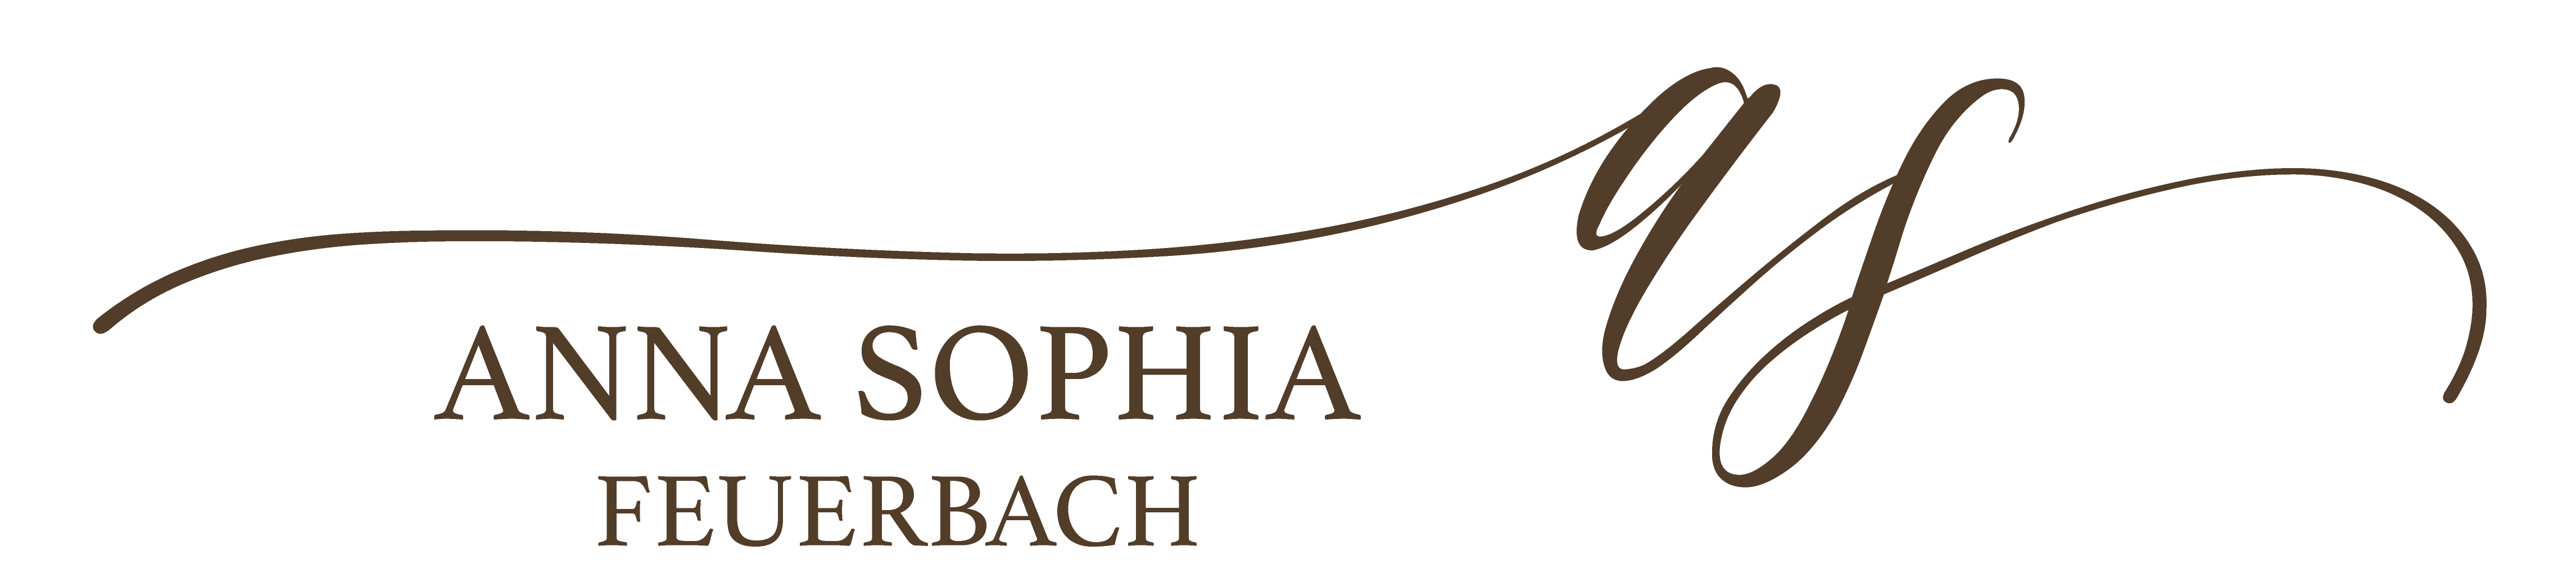 Logo Anna Sophia Feuerbach